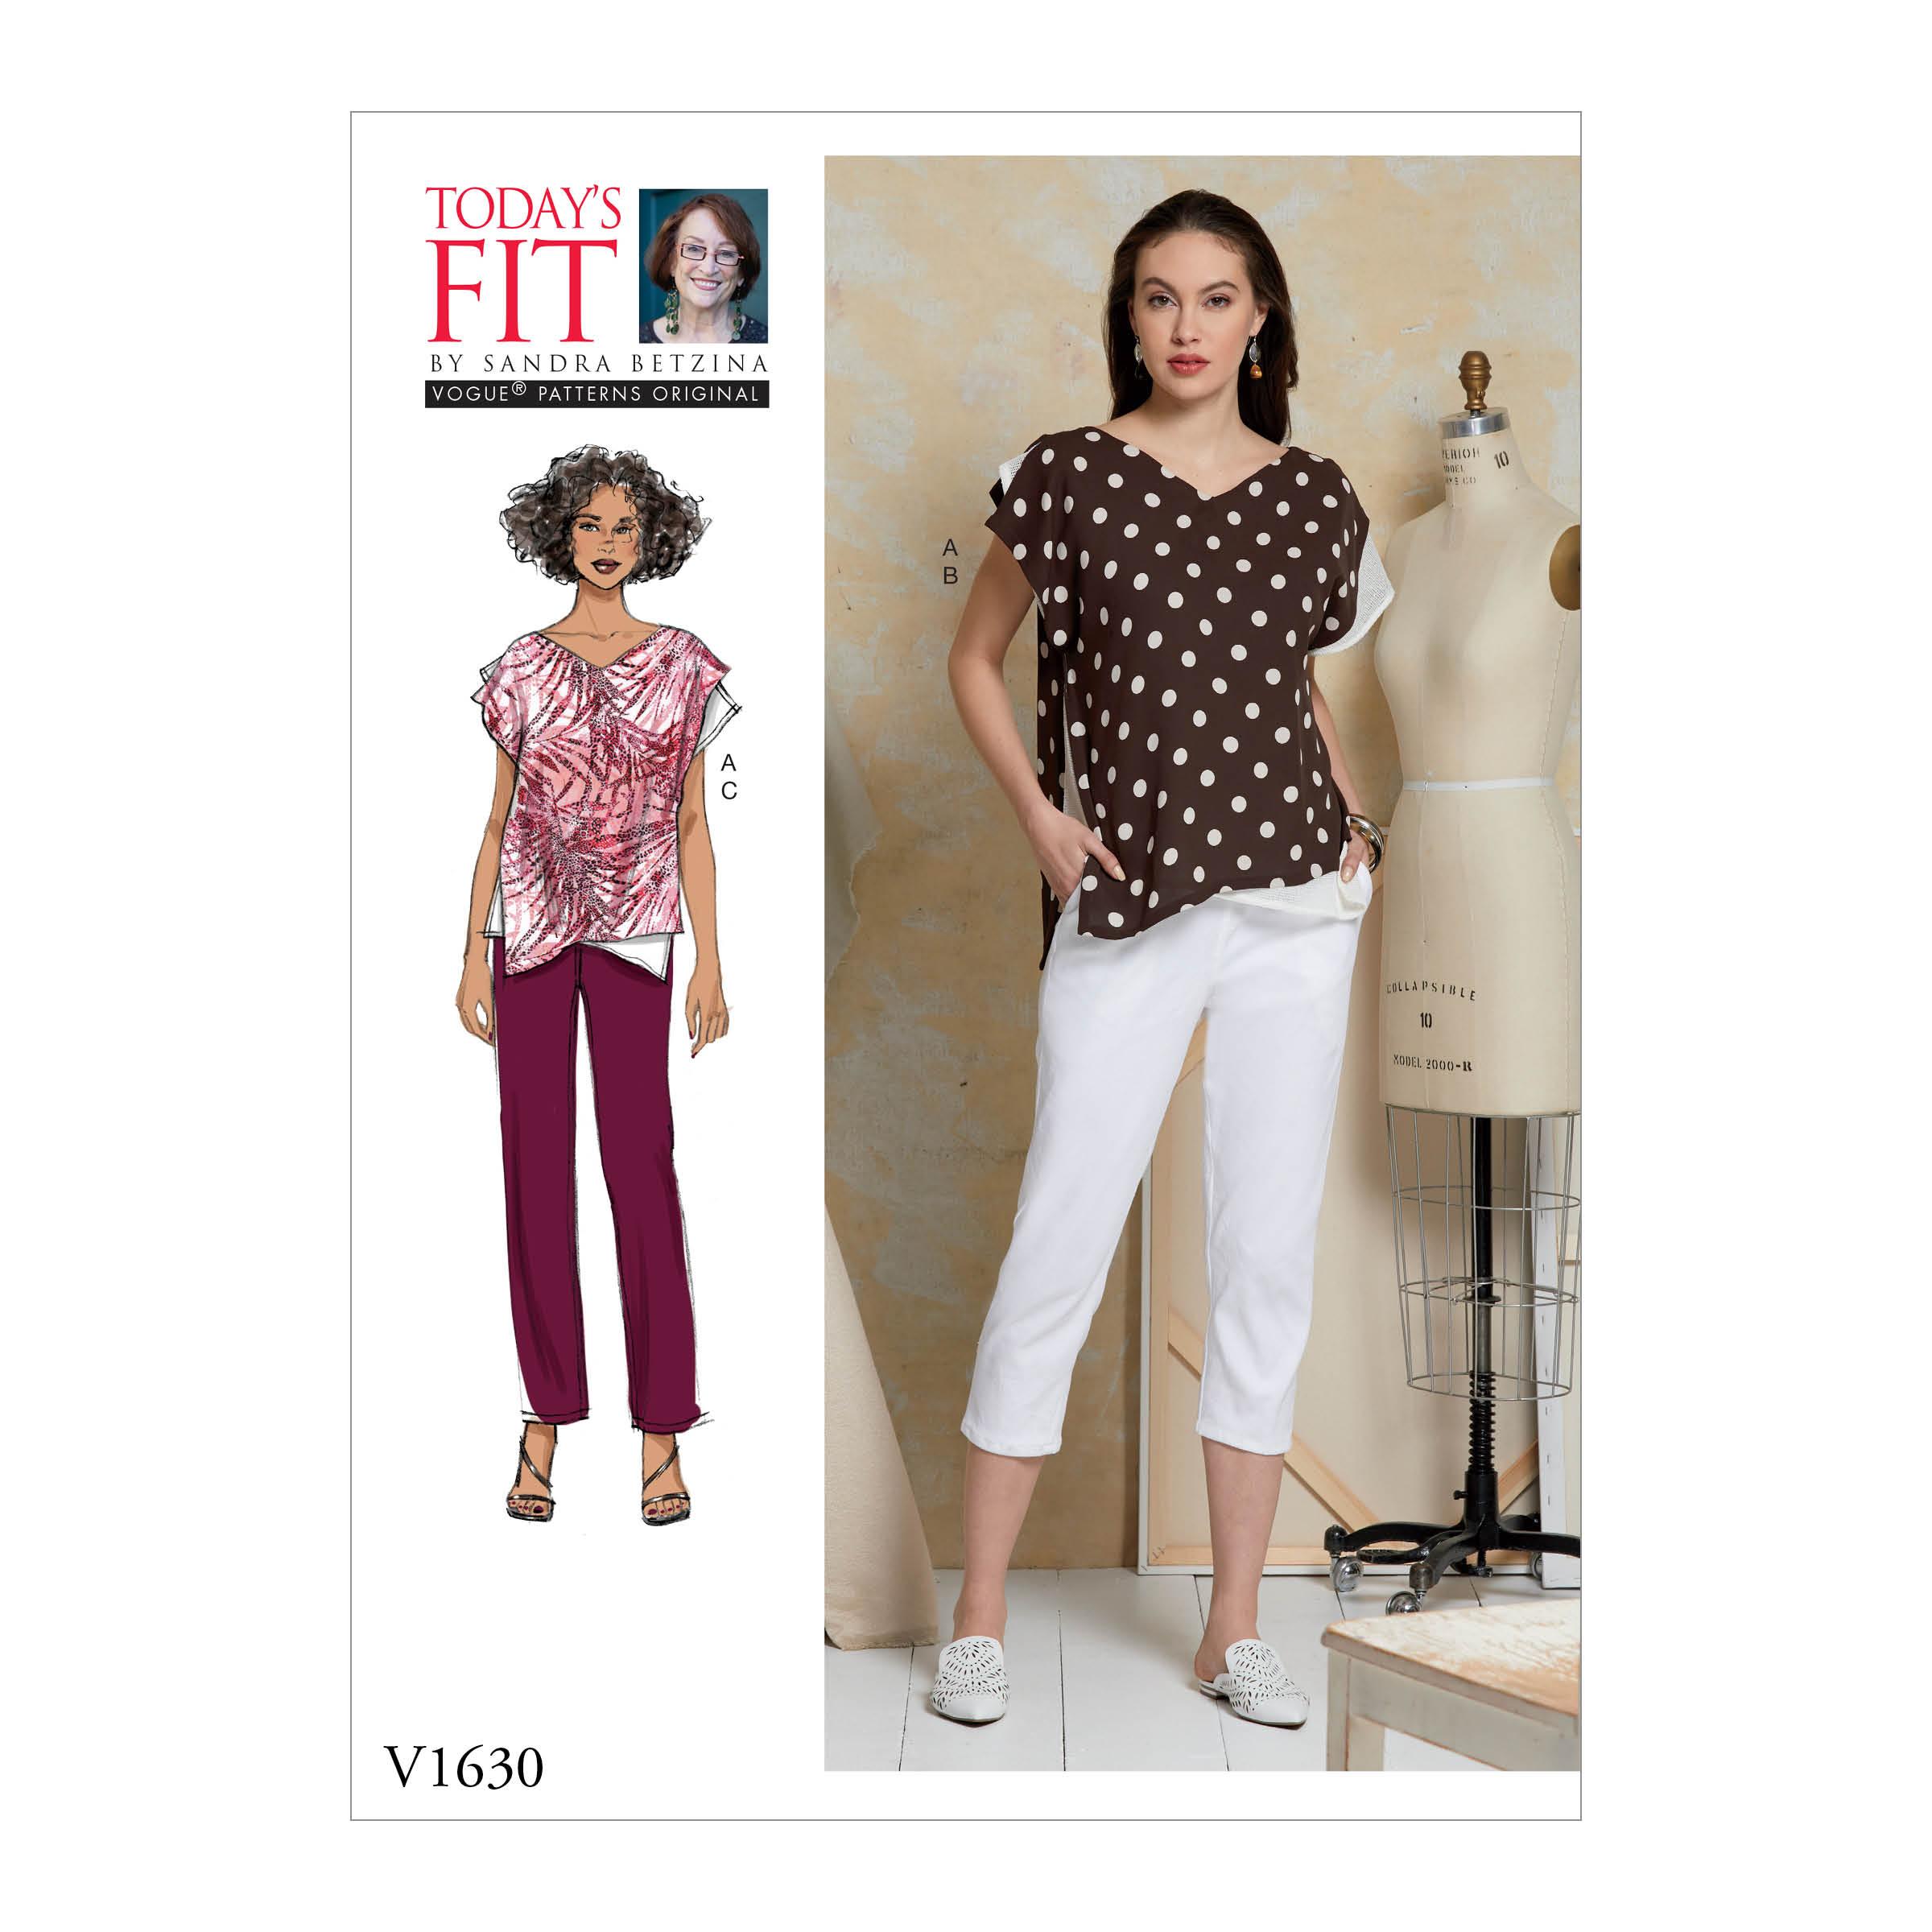 1d48f25472 Vogue Patterns 1630 MISSES' TOP AND PANTS